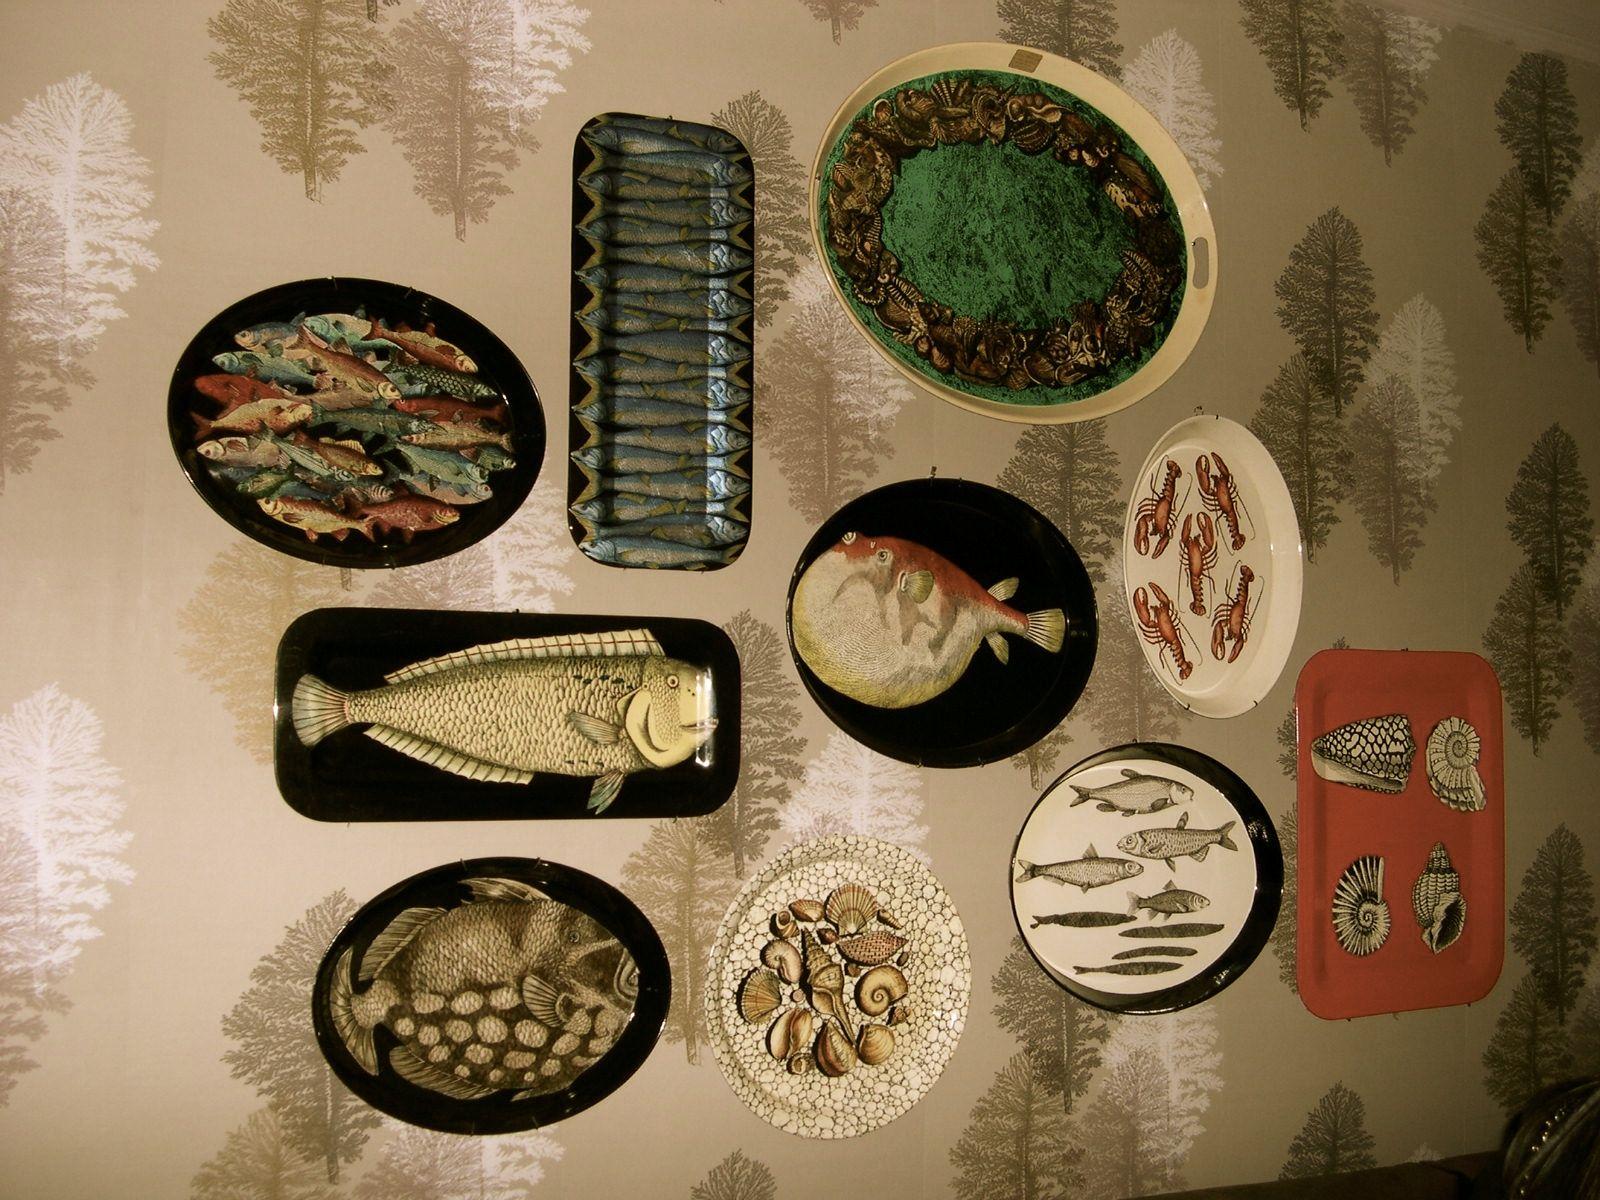 Fornasetti's house; bandejas con diseños de peces